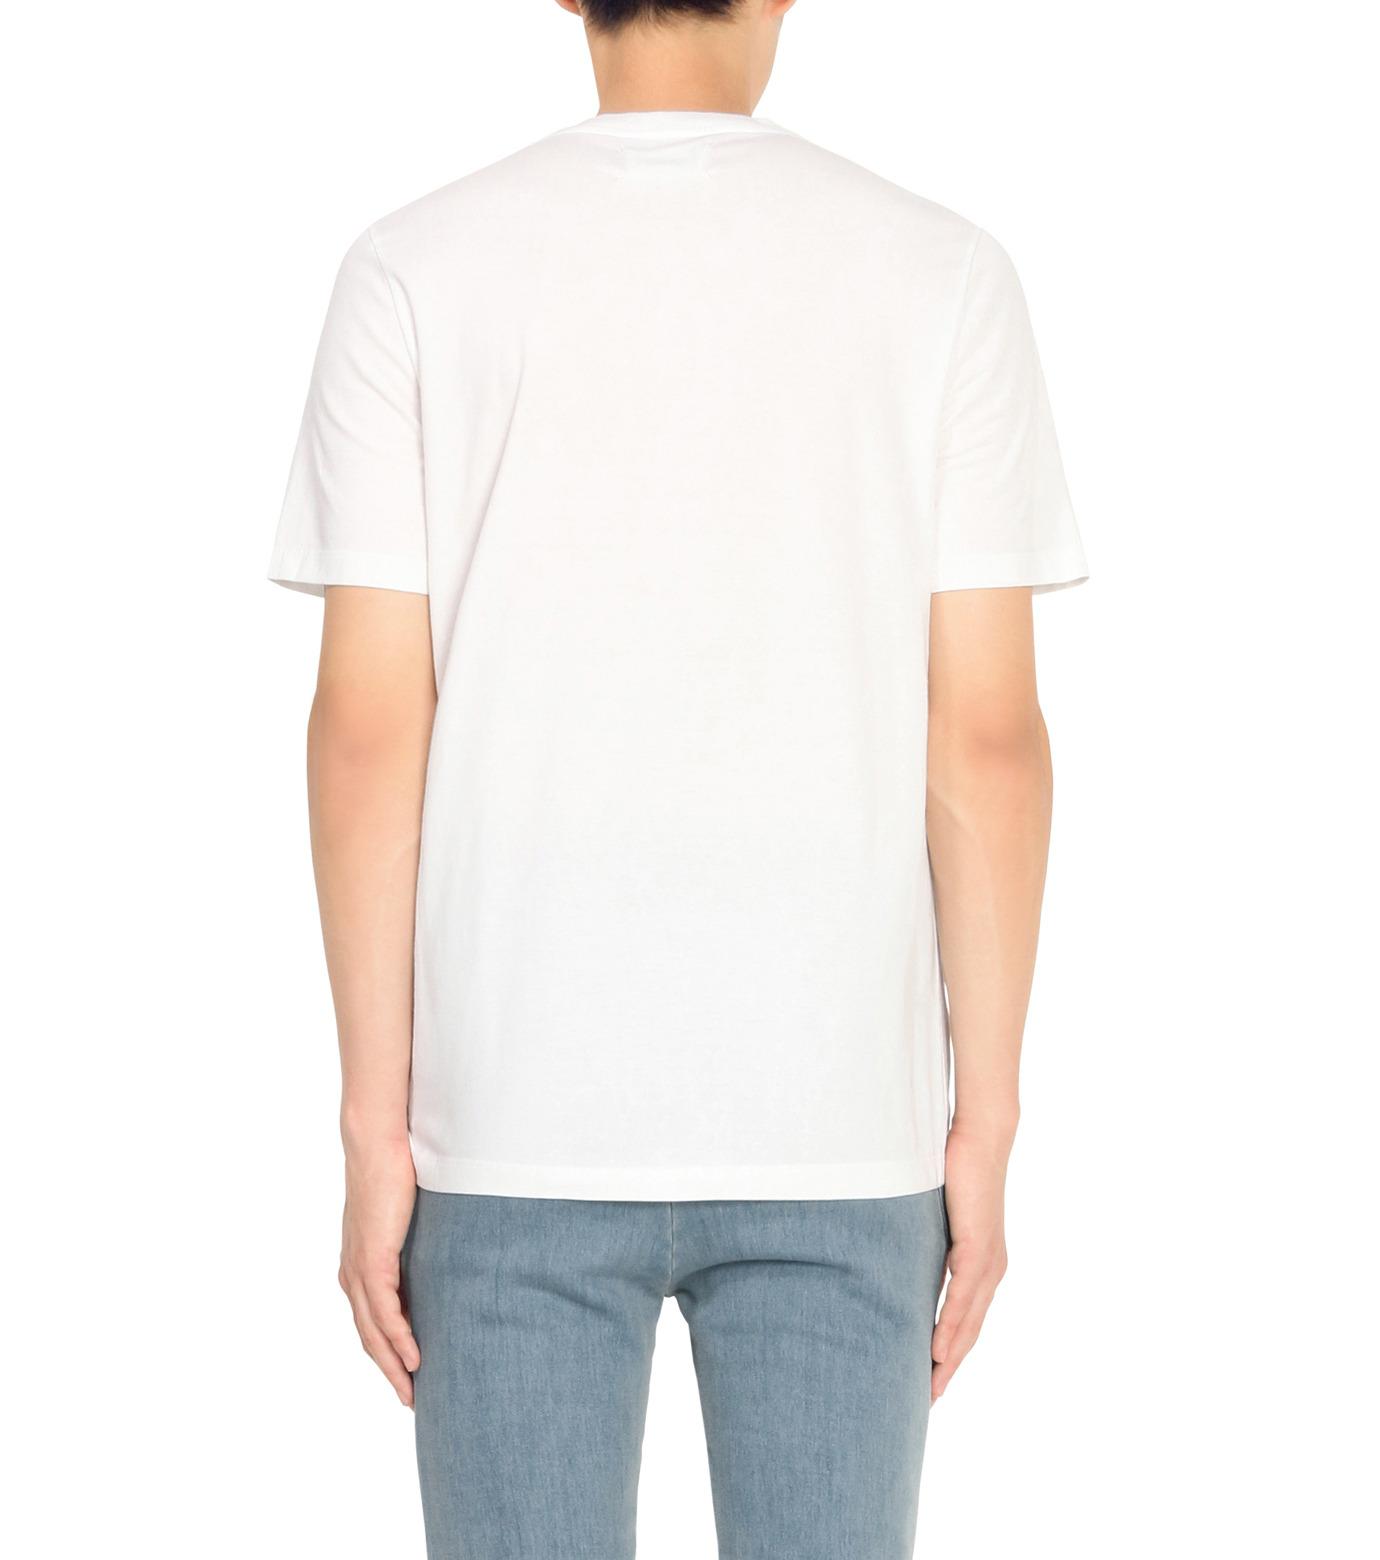 Maison Margiela(メゾン マルジェラ)のPrint T-WHITE(カットソー/cut and sewn)-S50GC0436-4 拡大詳細画像2